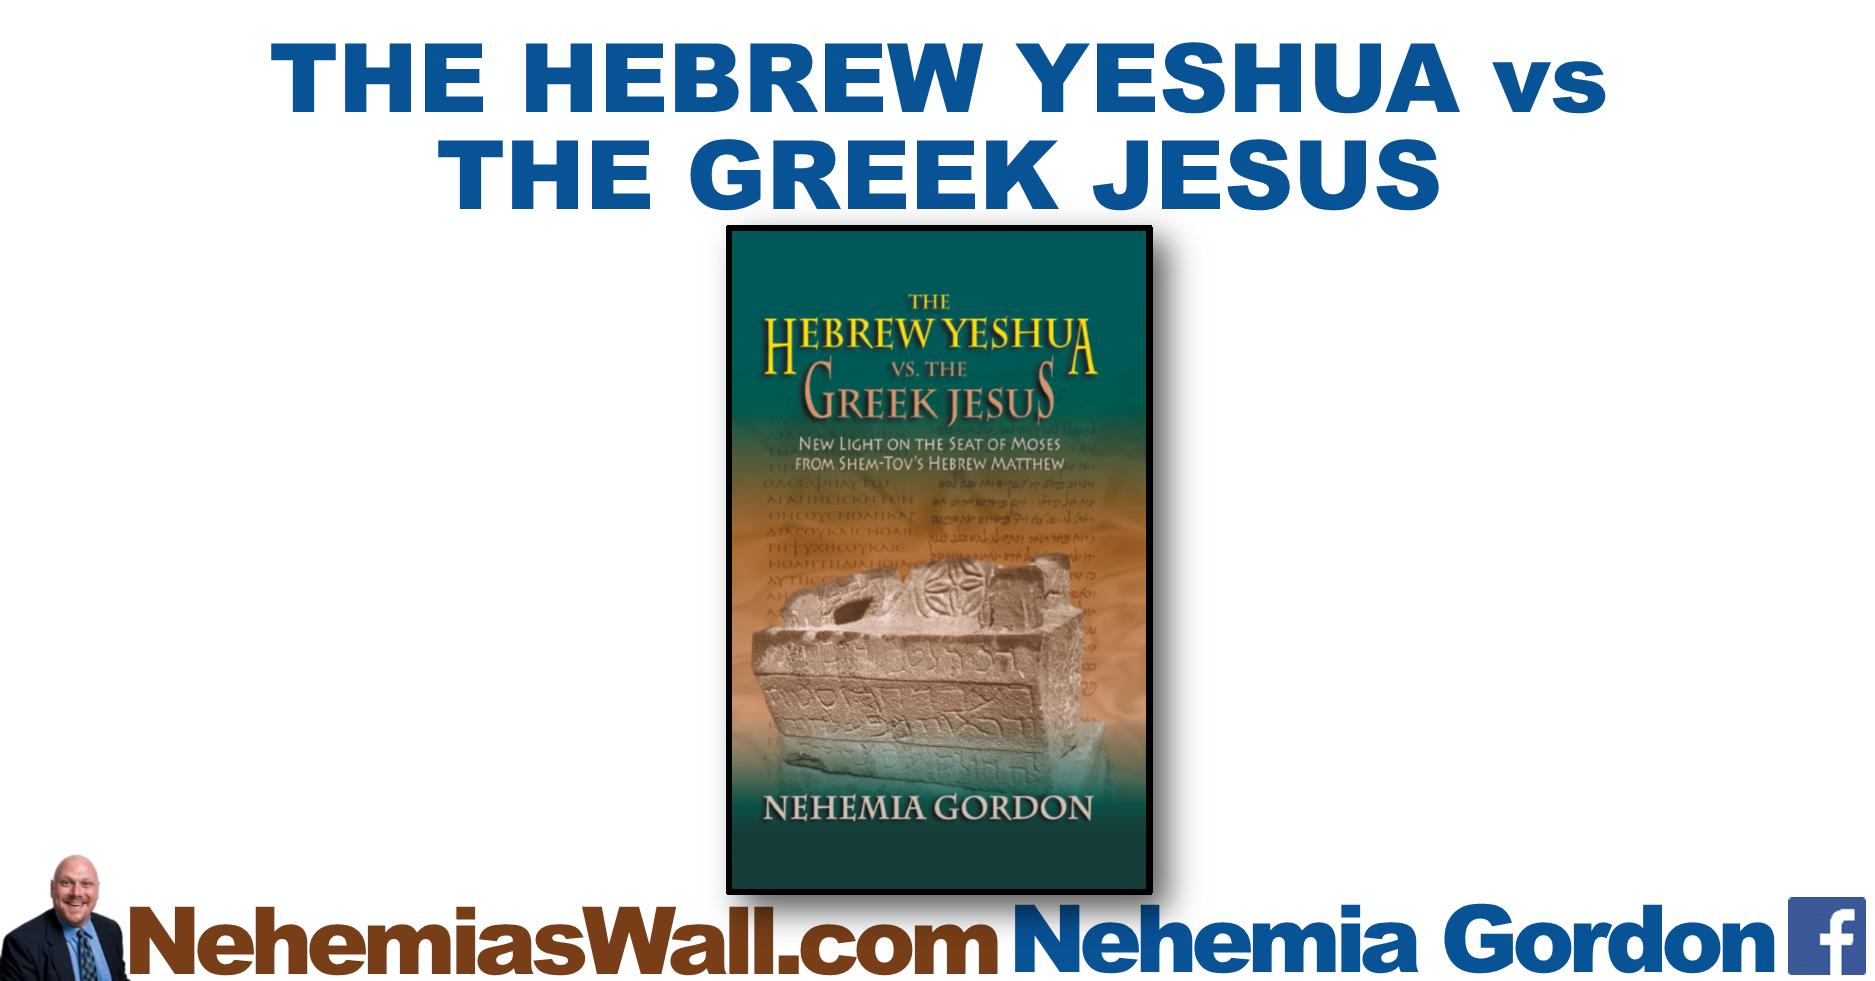 The Hebrew Yeshua vs. the Greek Jesus - Book ...